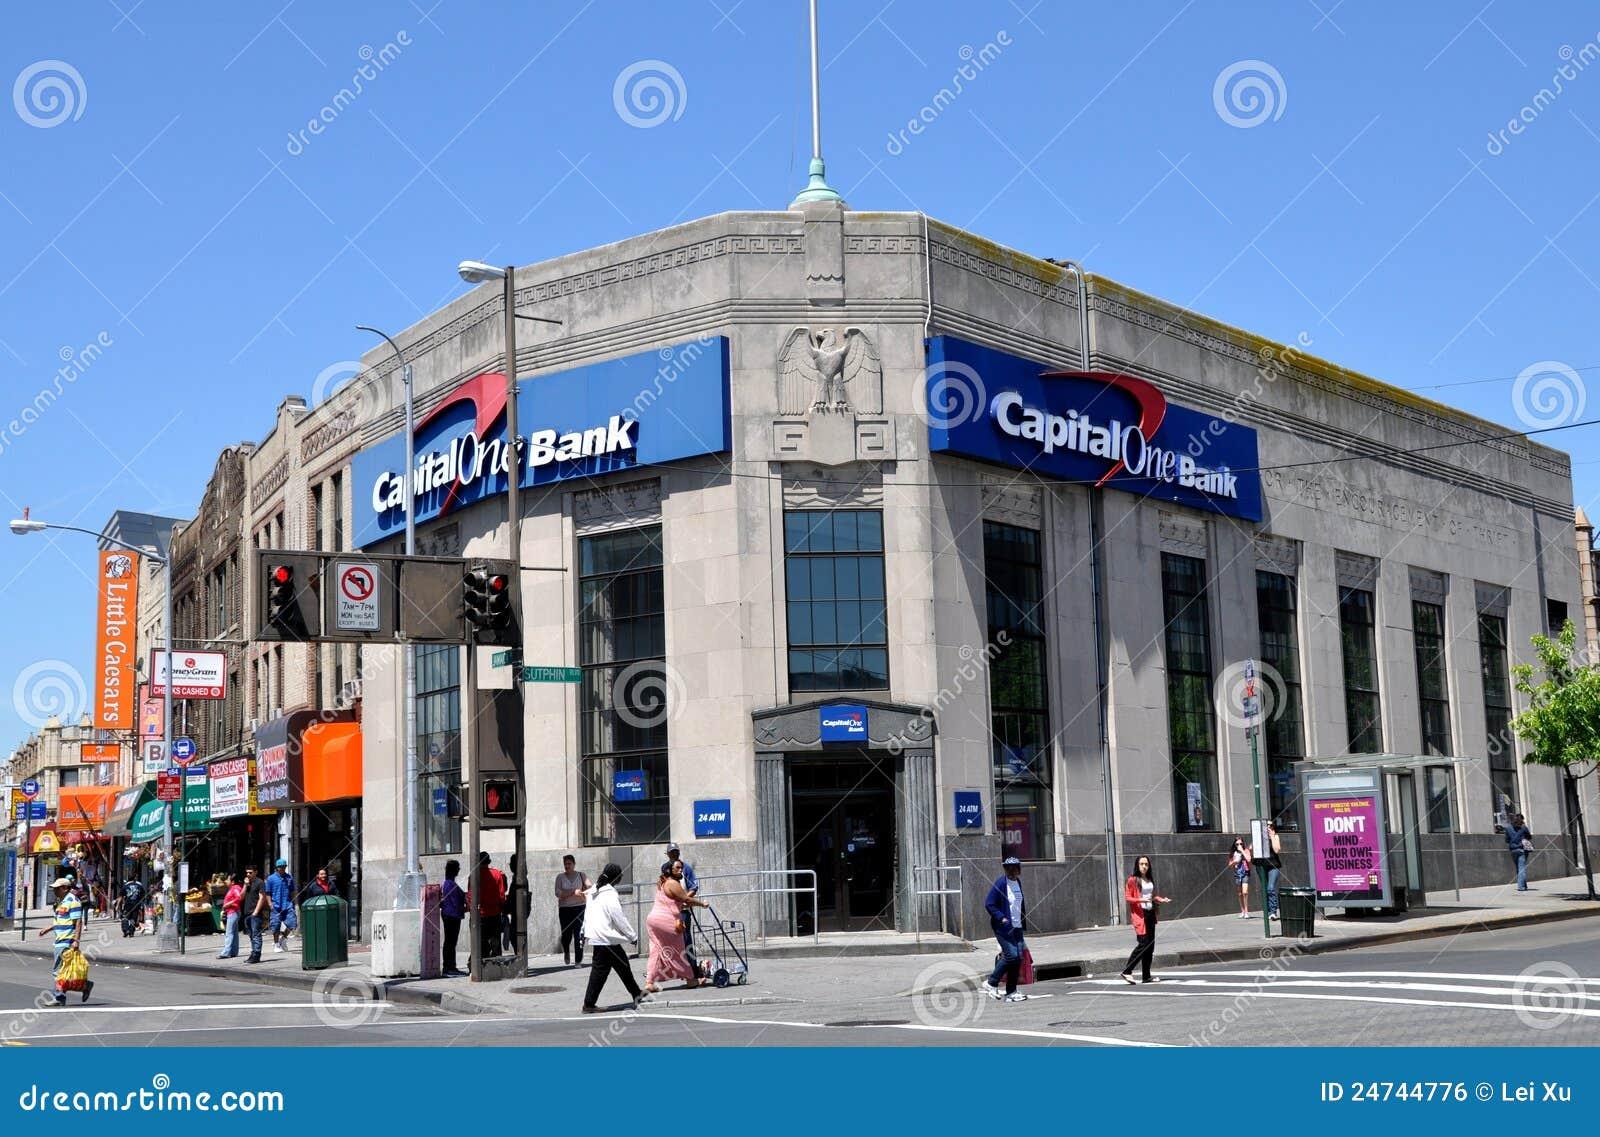 NYC: La Banca del capitale uno in regine